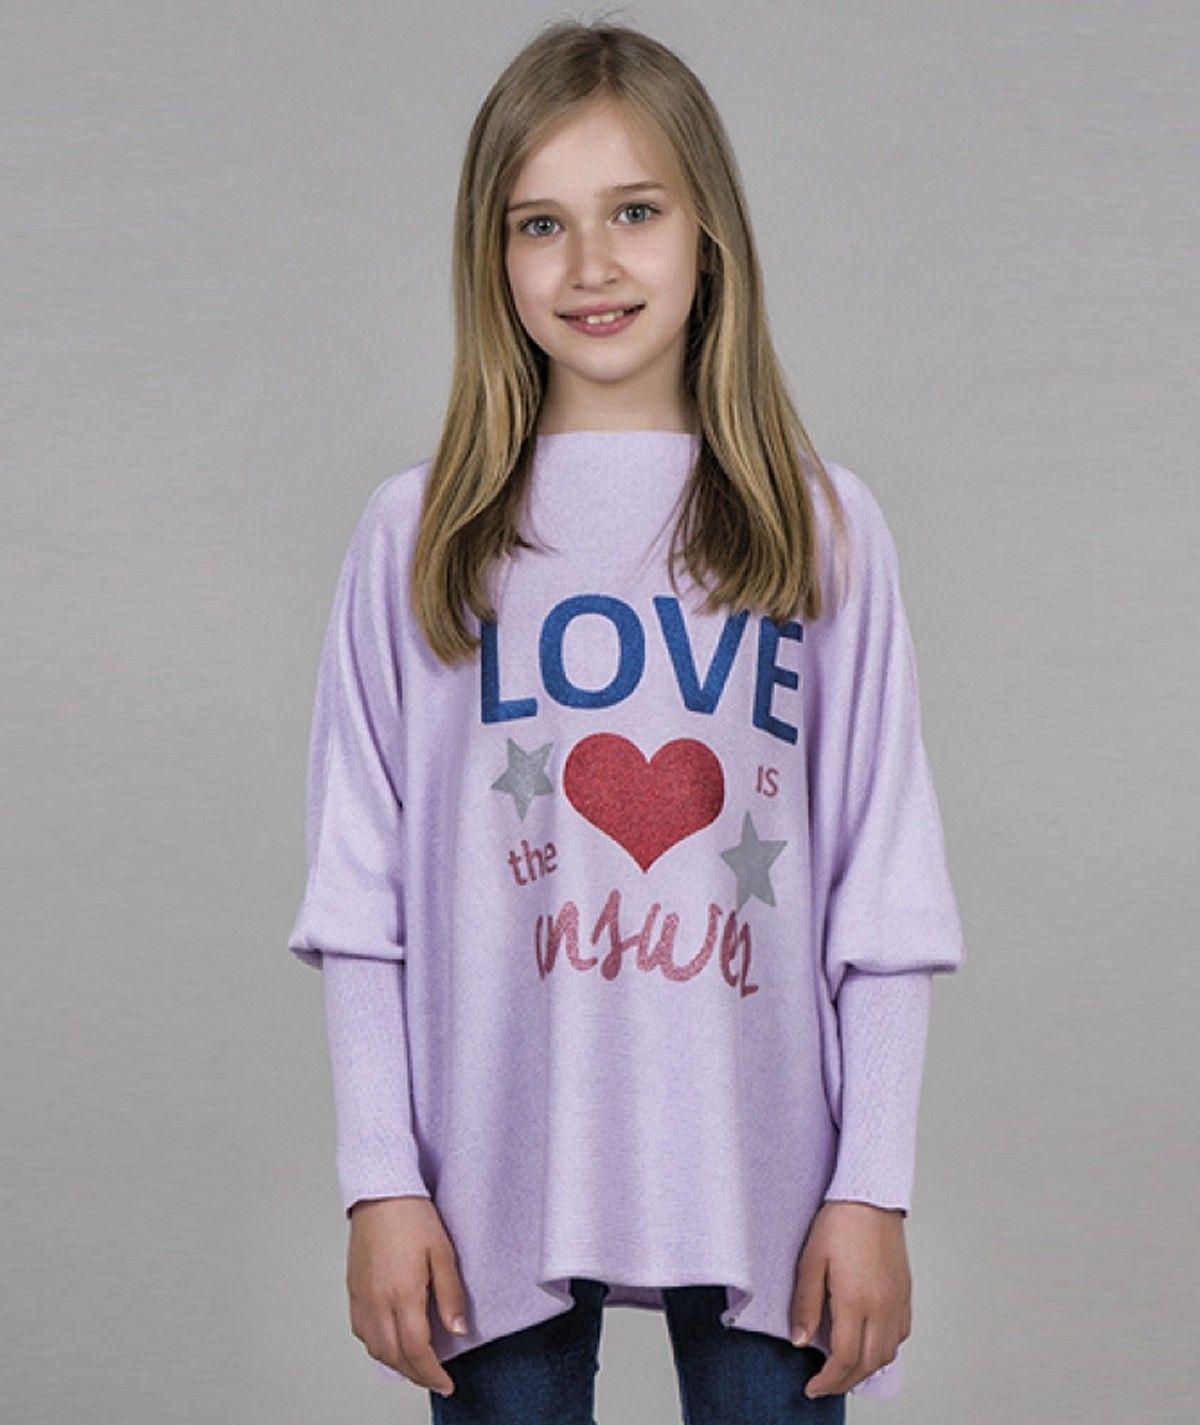 Camisola motivo love is the...